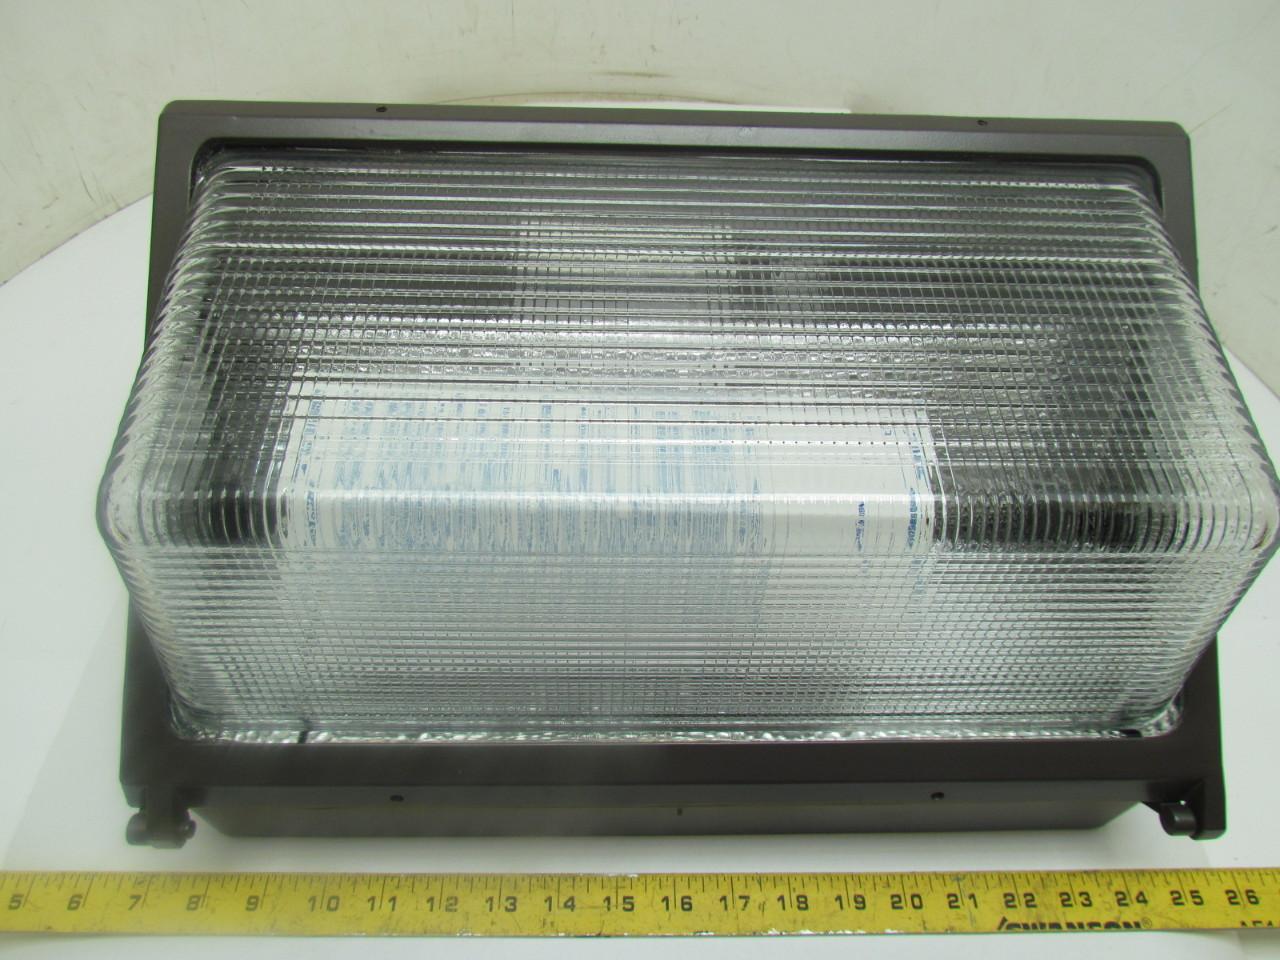 Lithonia TWR2250mTBSCWALPI 250 Watt Metal Halide Ballast Wall Pack Light Fixture